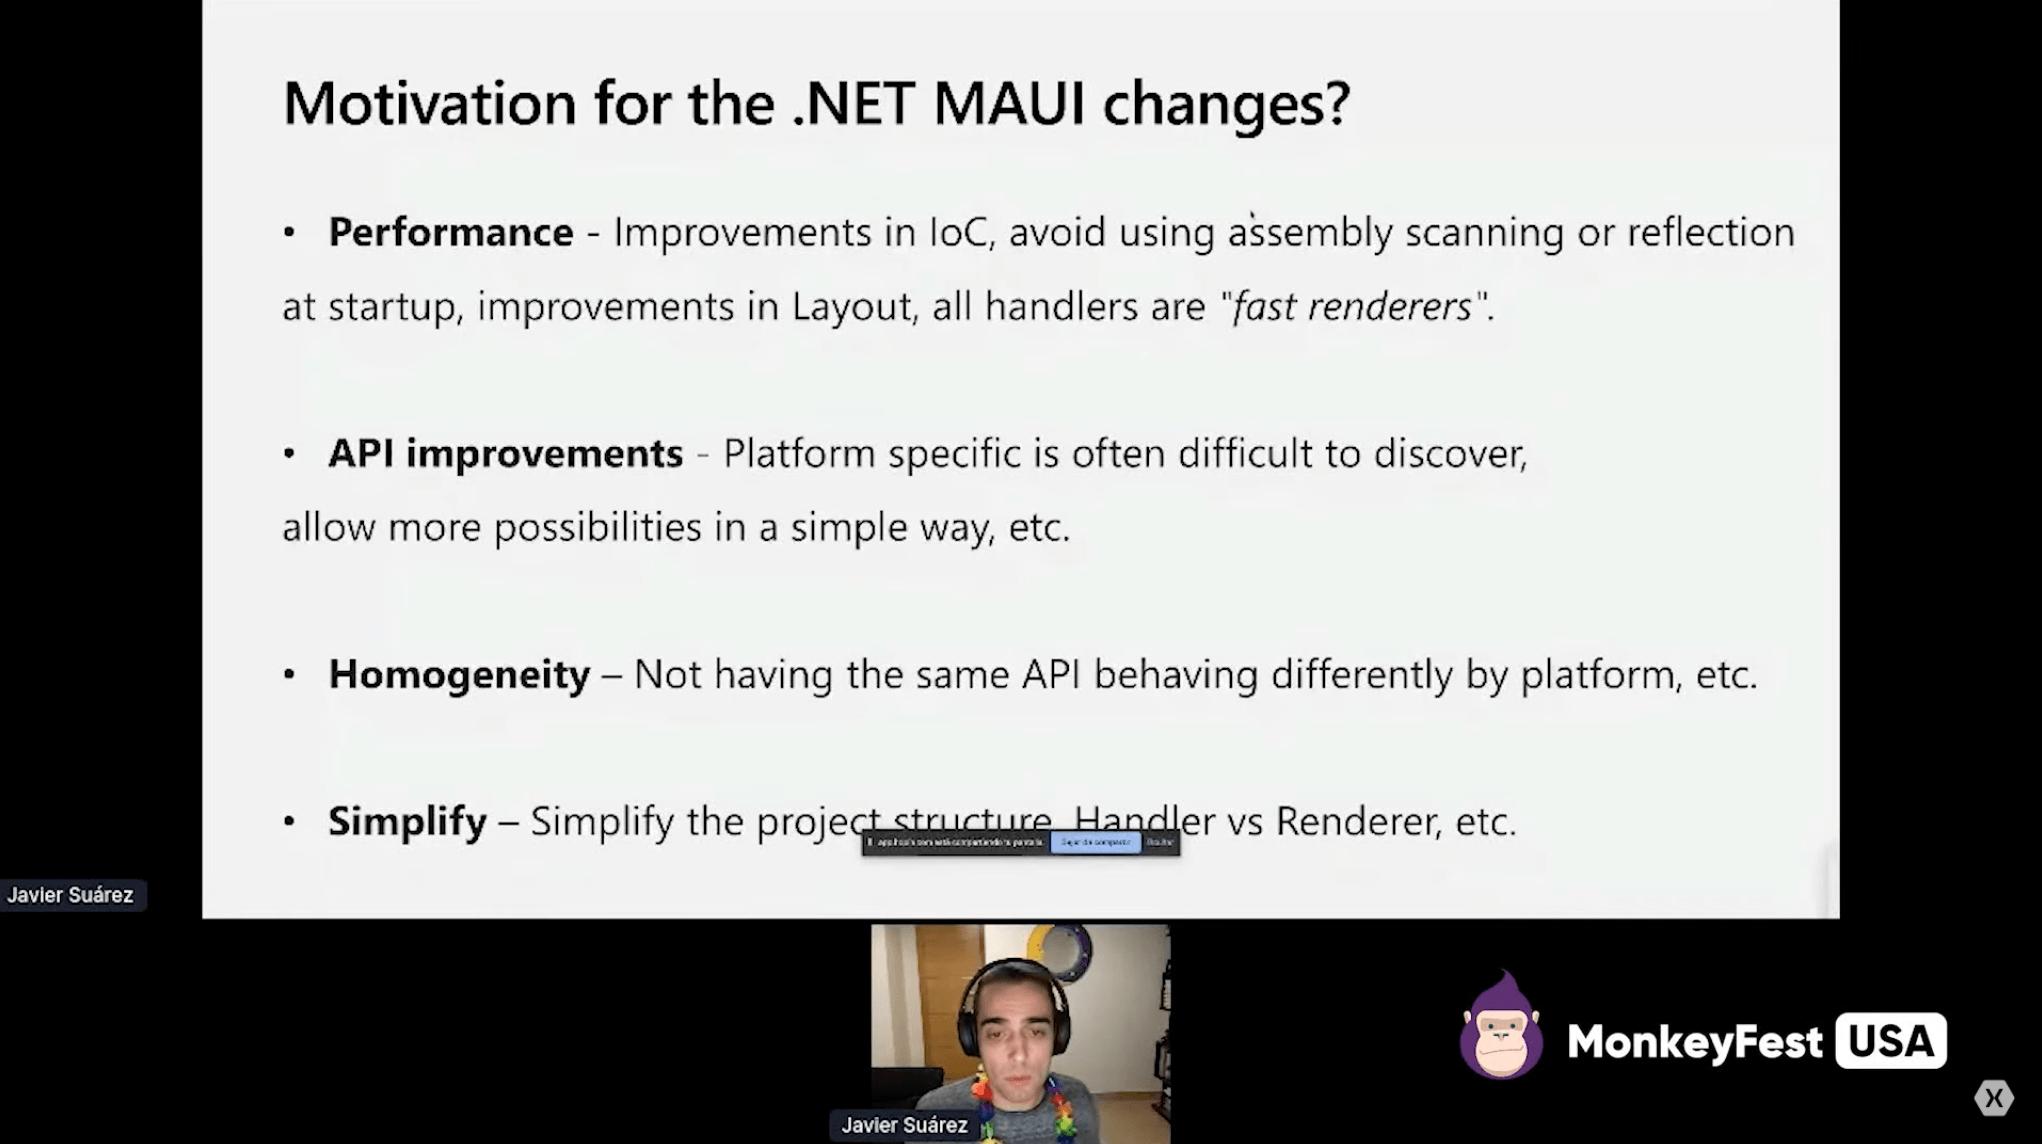 Screenshot of MokeyFest presentation by Javier Suárez, on a slide about motivation for .NET MAUI changes.